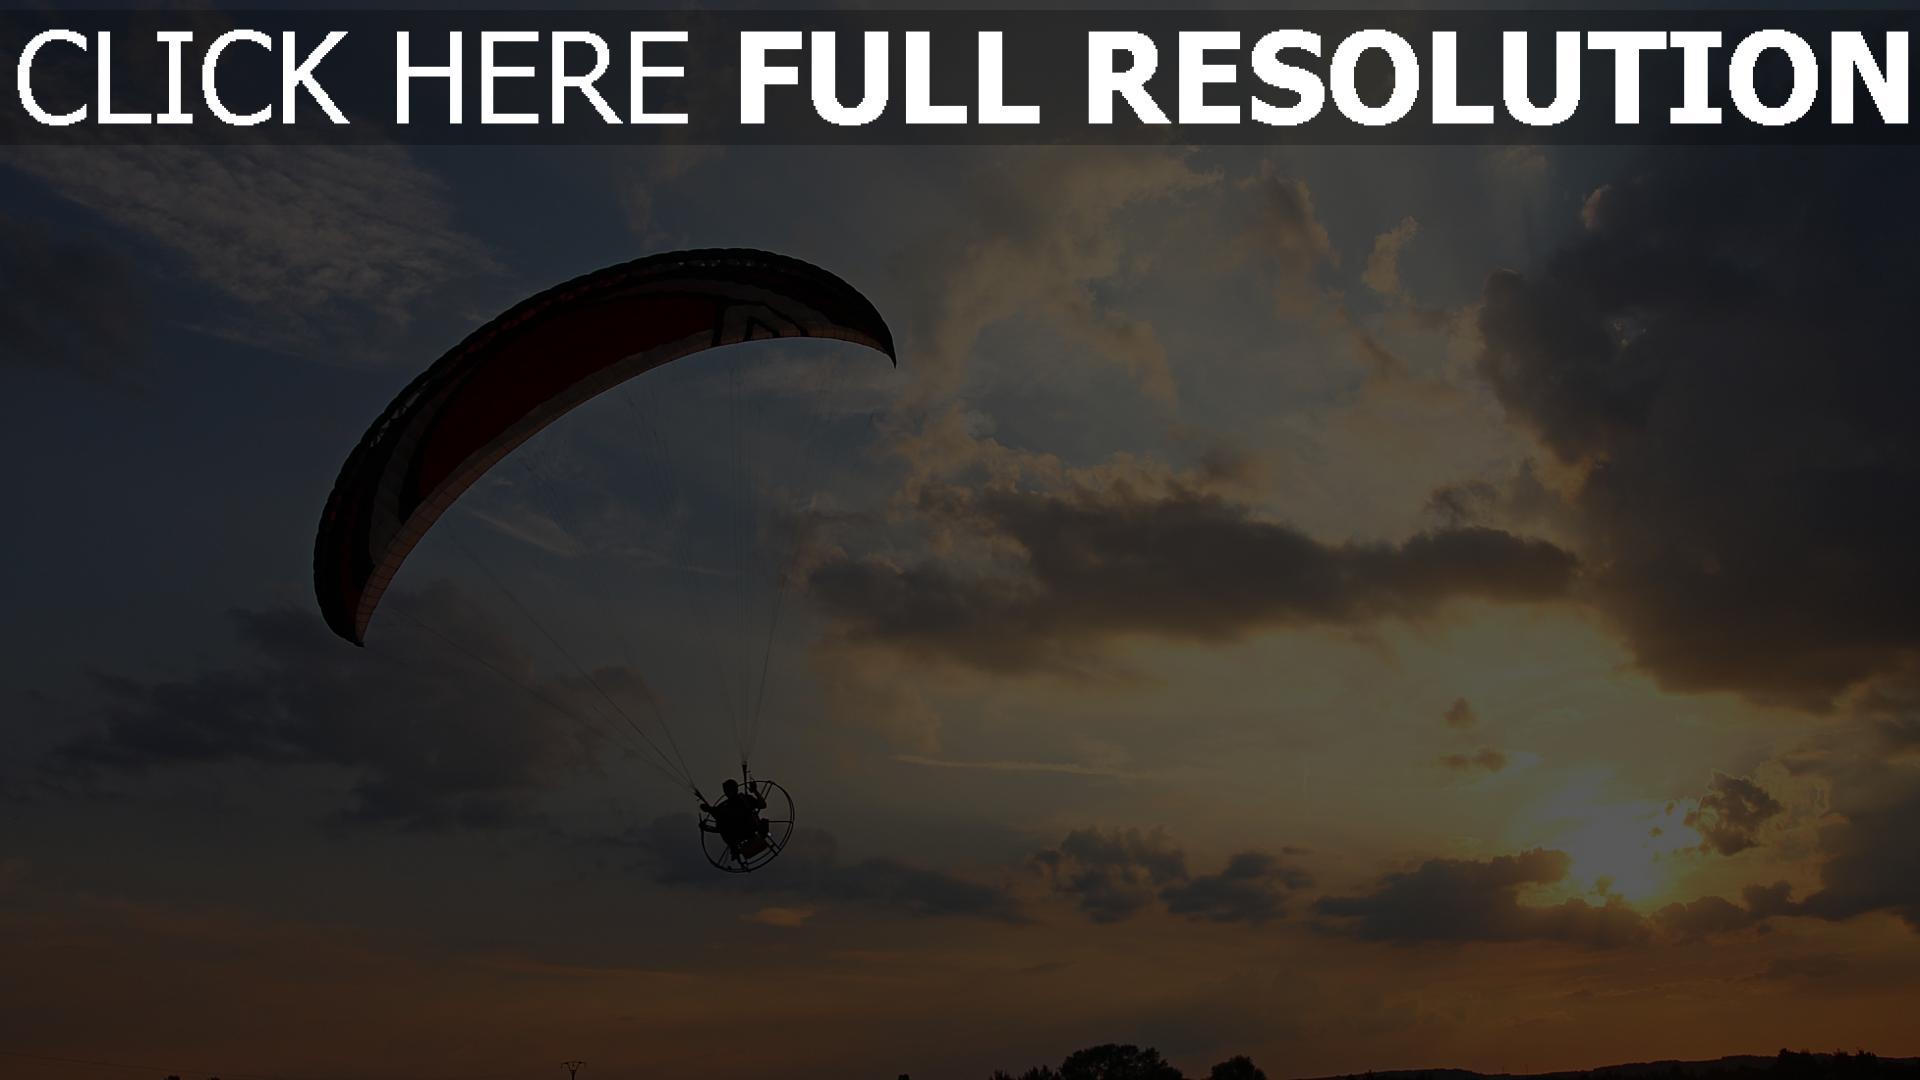 hd hintergrundbilder flug sonnenuntergang gleitschirm himmel 1920x1080